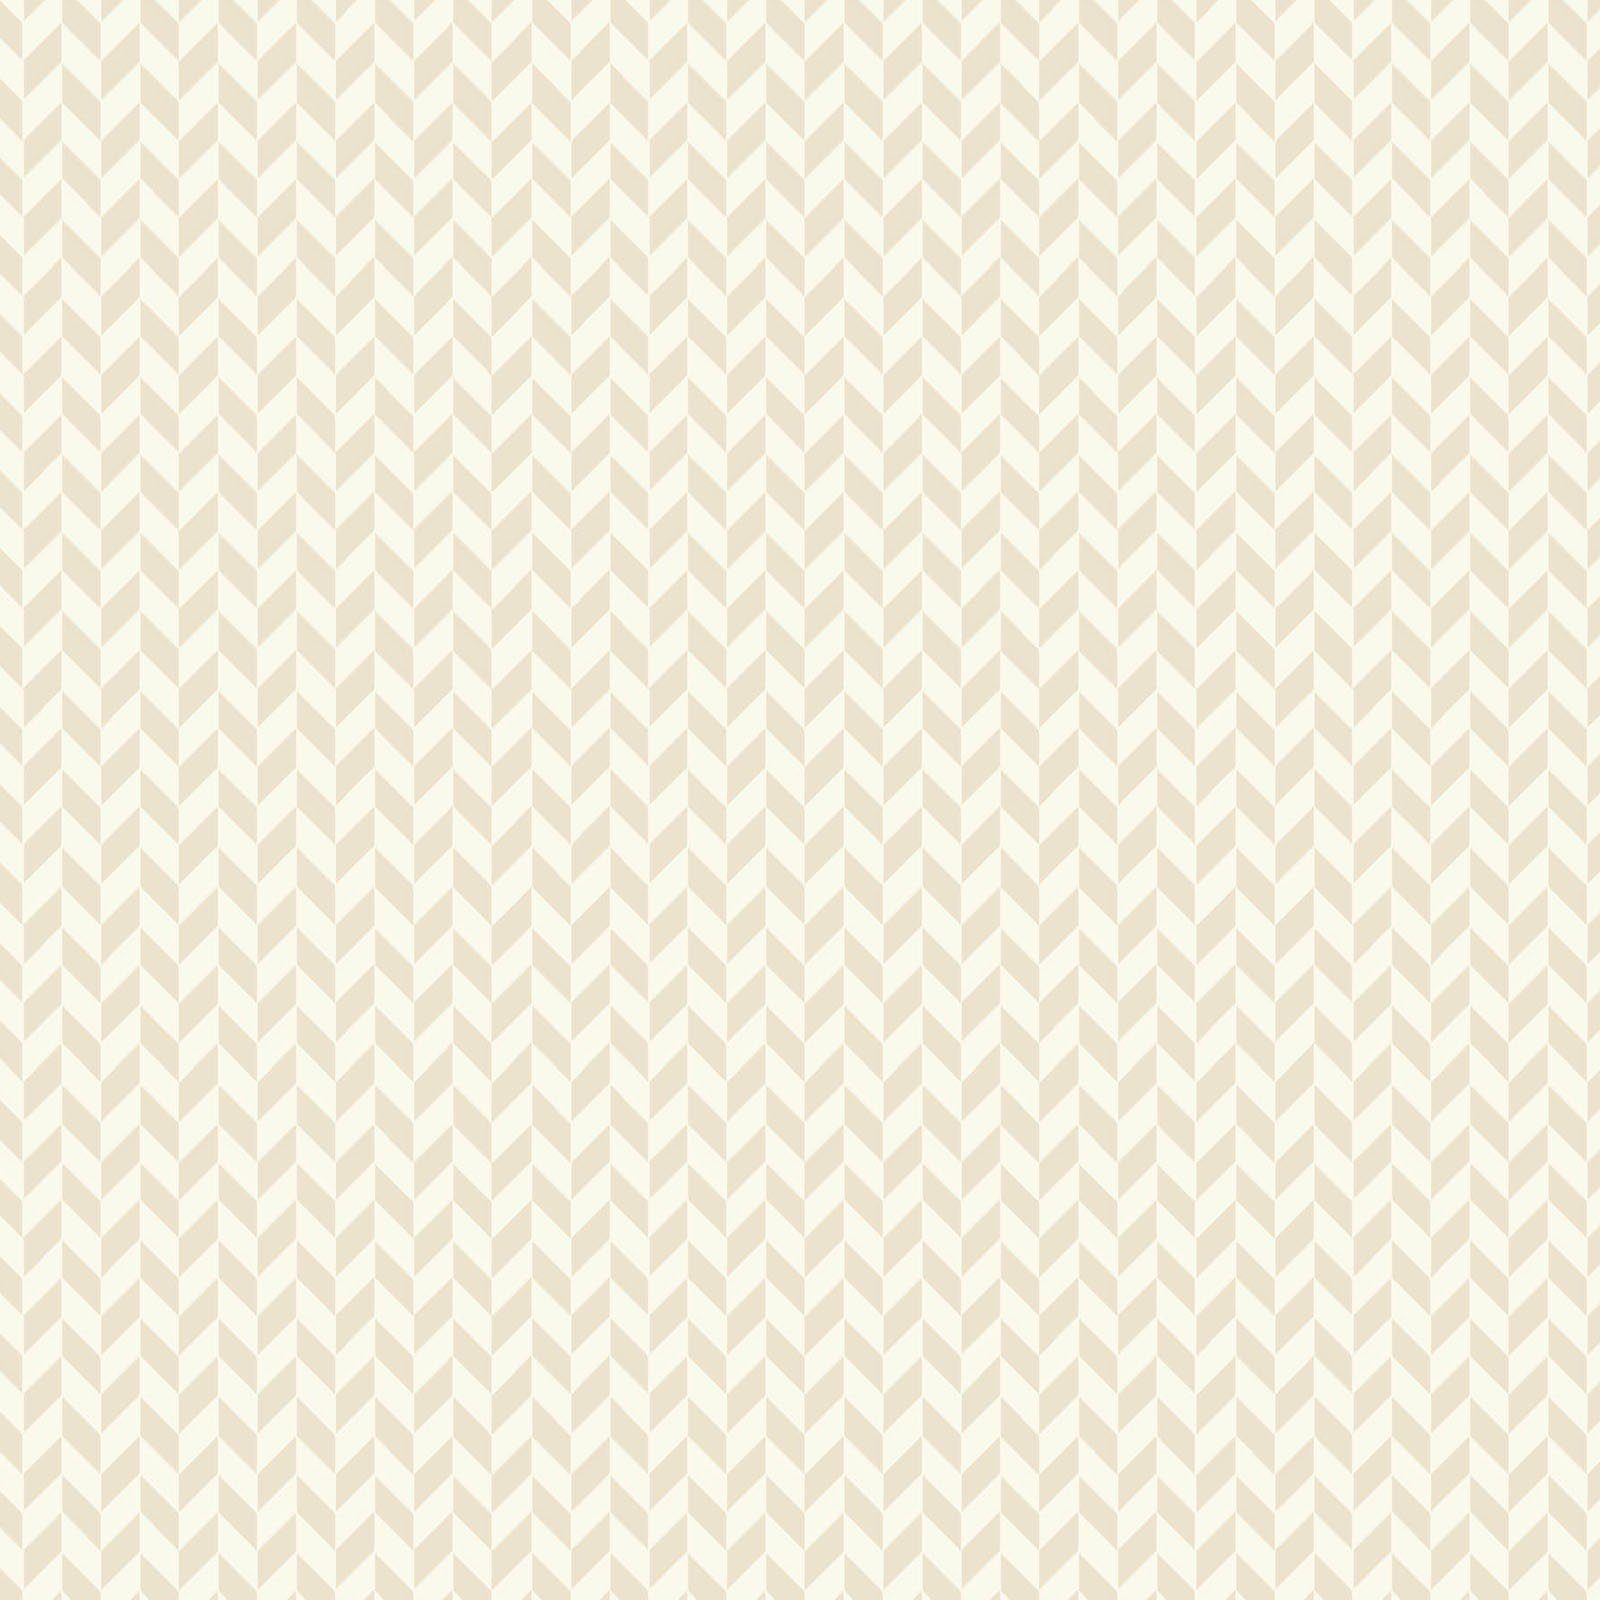 Kimberbell Basics Herringbone Texture Cream MAS9397-E